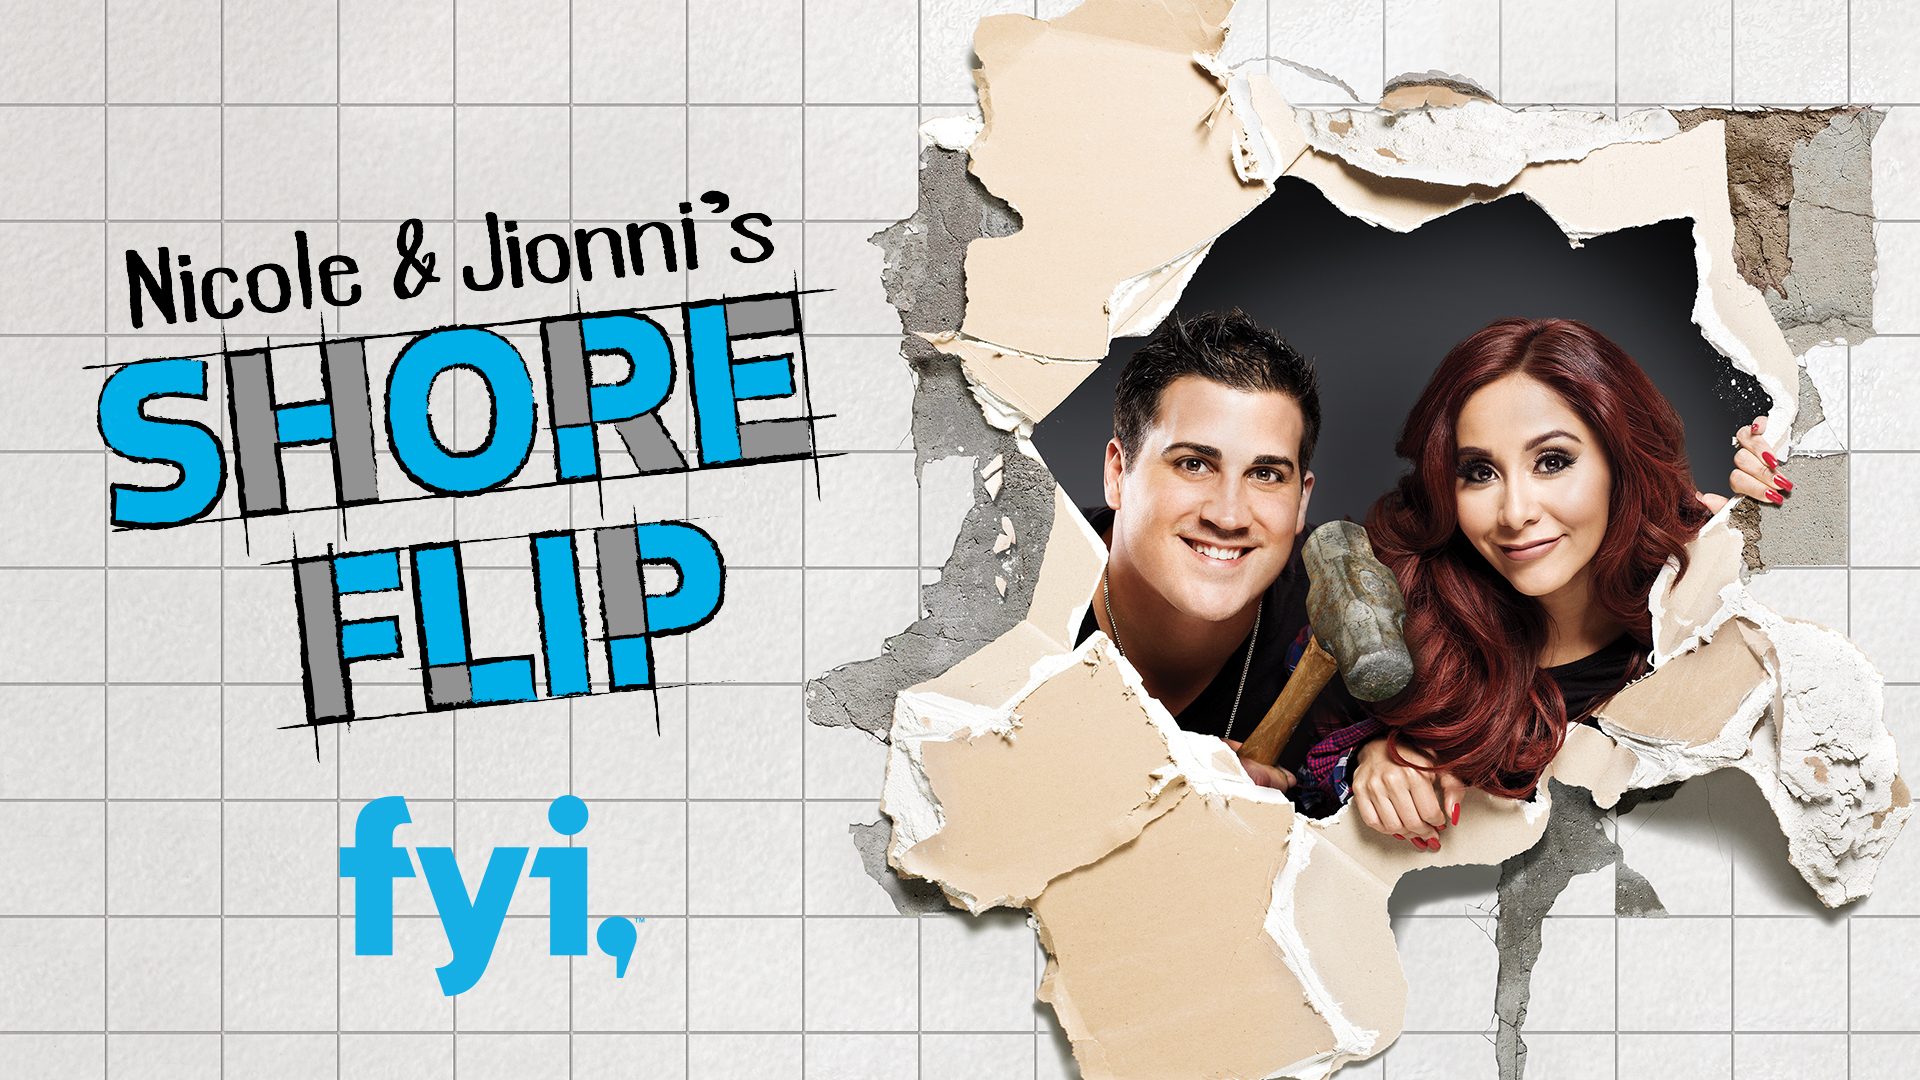 Nicole & Jionni's Shore Flip